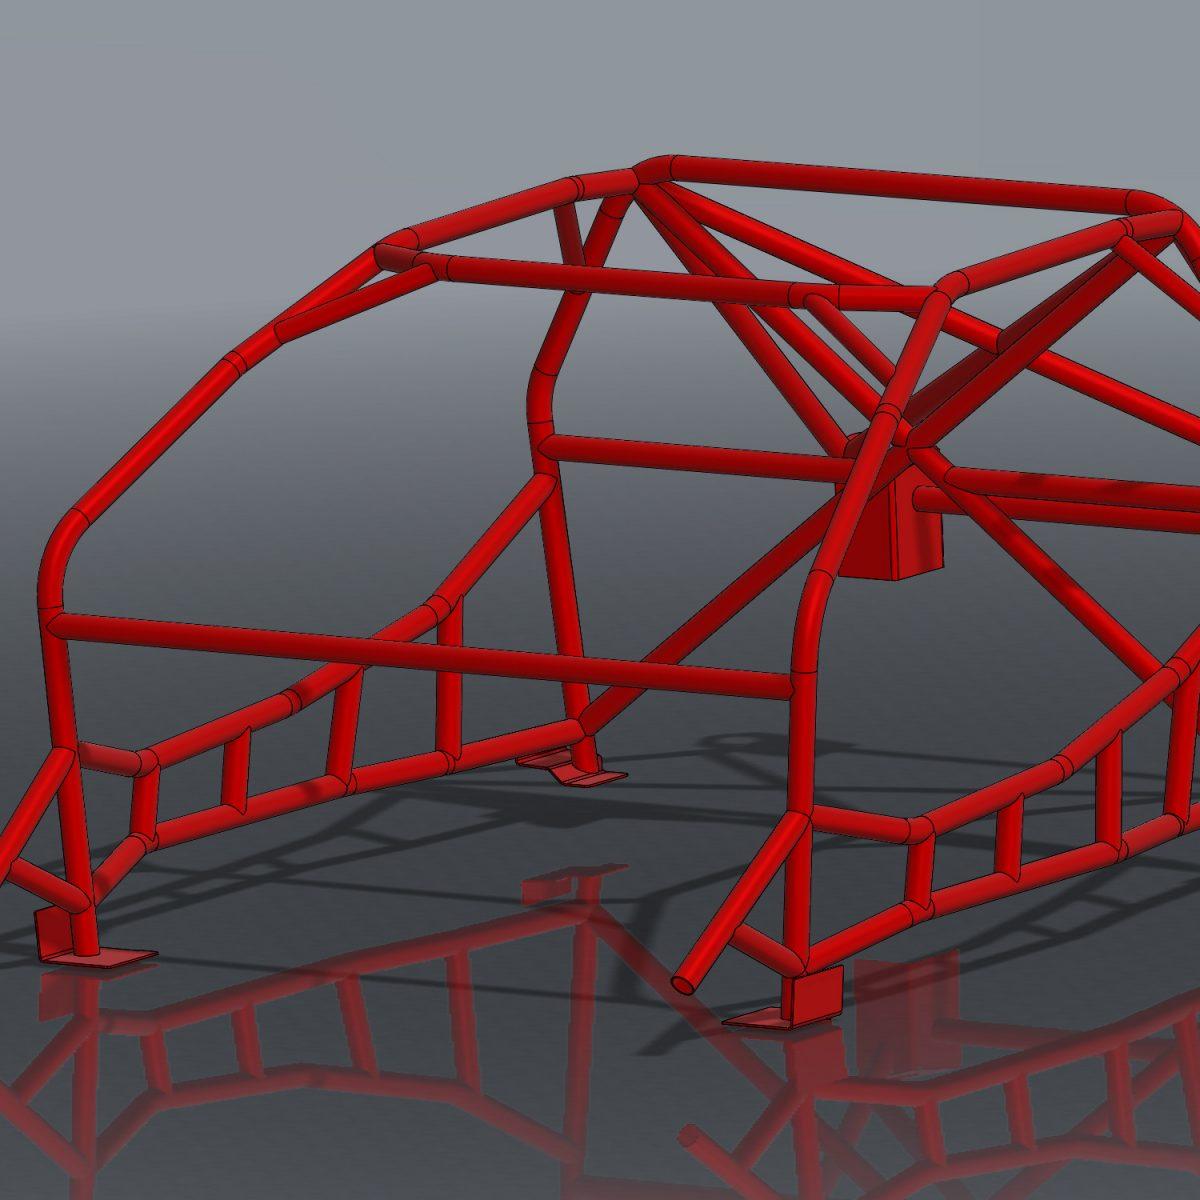 Ultra Tight S13 Slim Ladder Roll Cage Kit